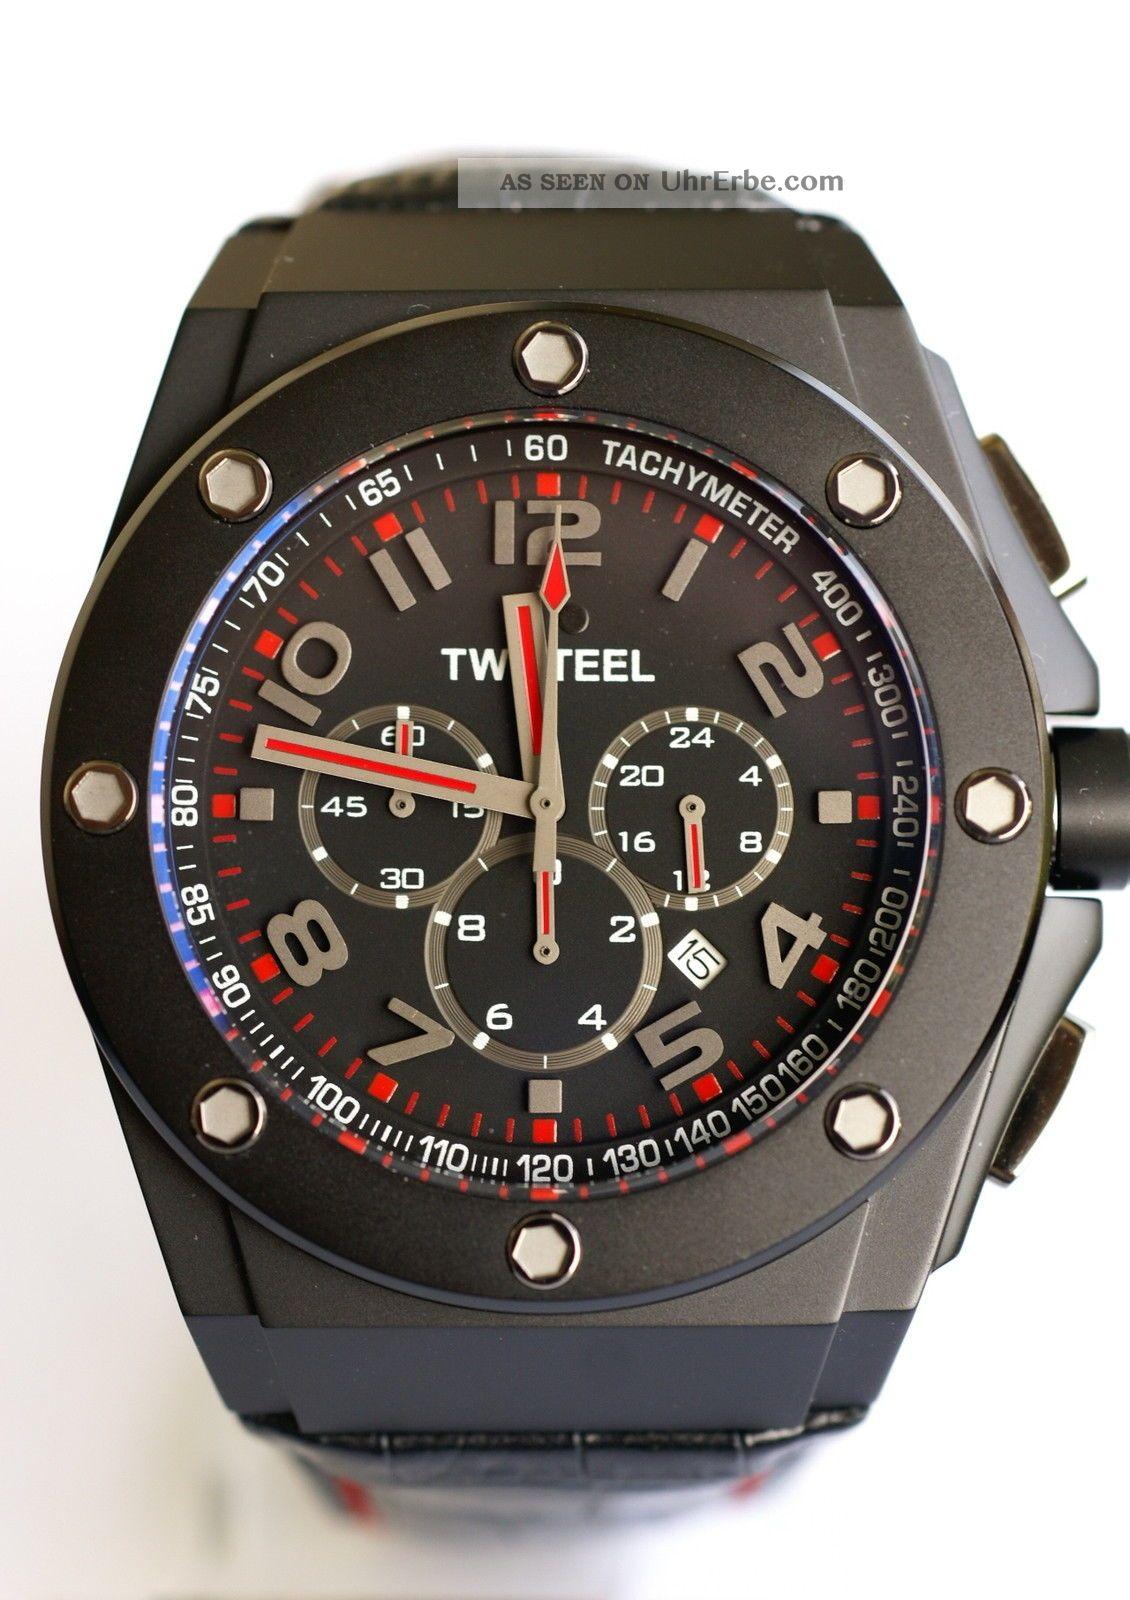 Tw - Steel - Chrono,  Schwarz,  Mit Lederband,  Twce4009 Armbanduhren Bild